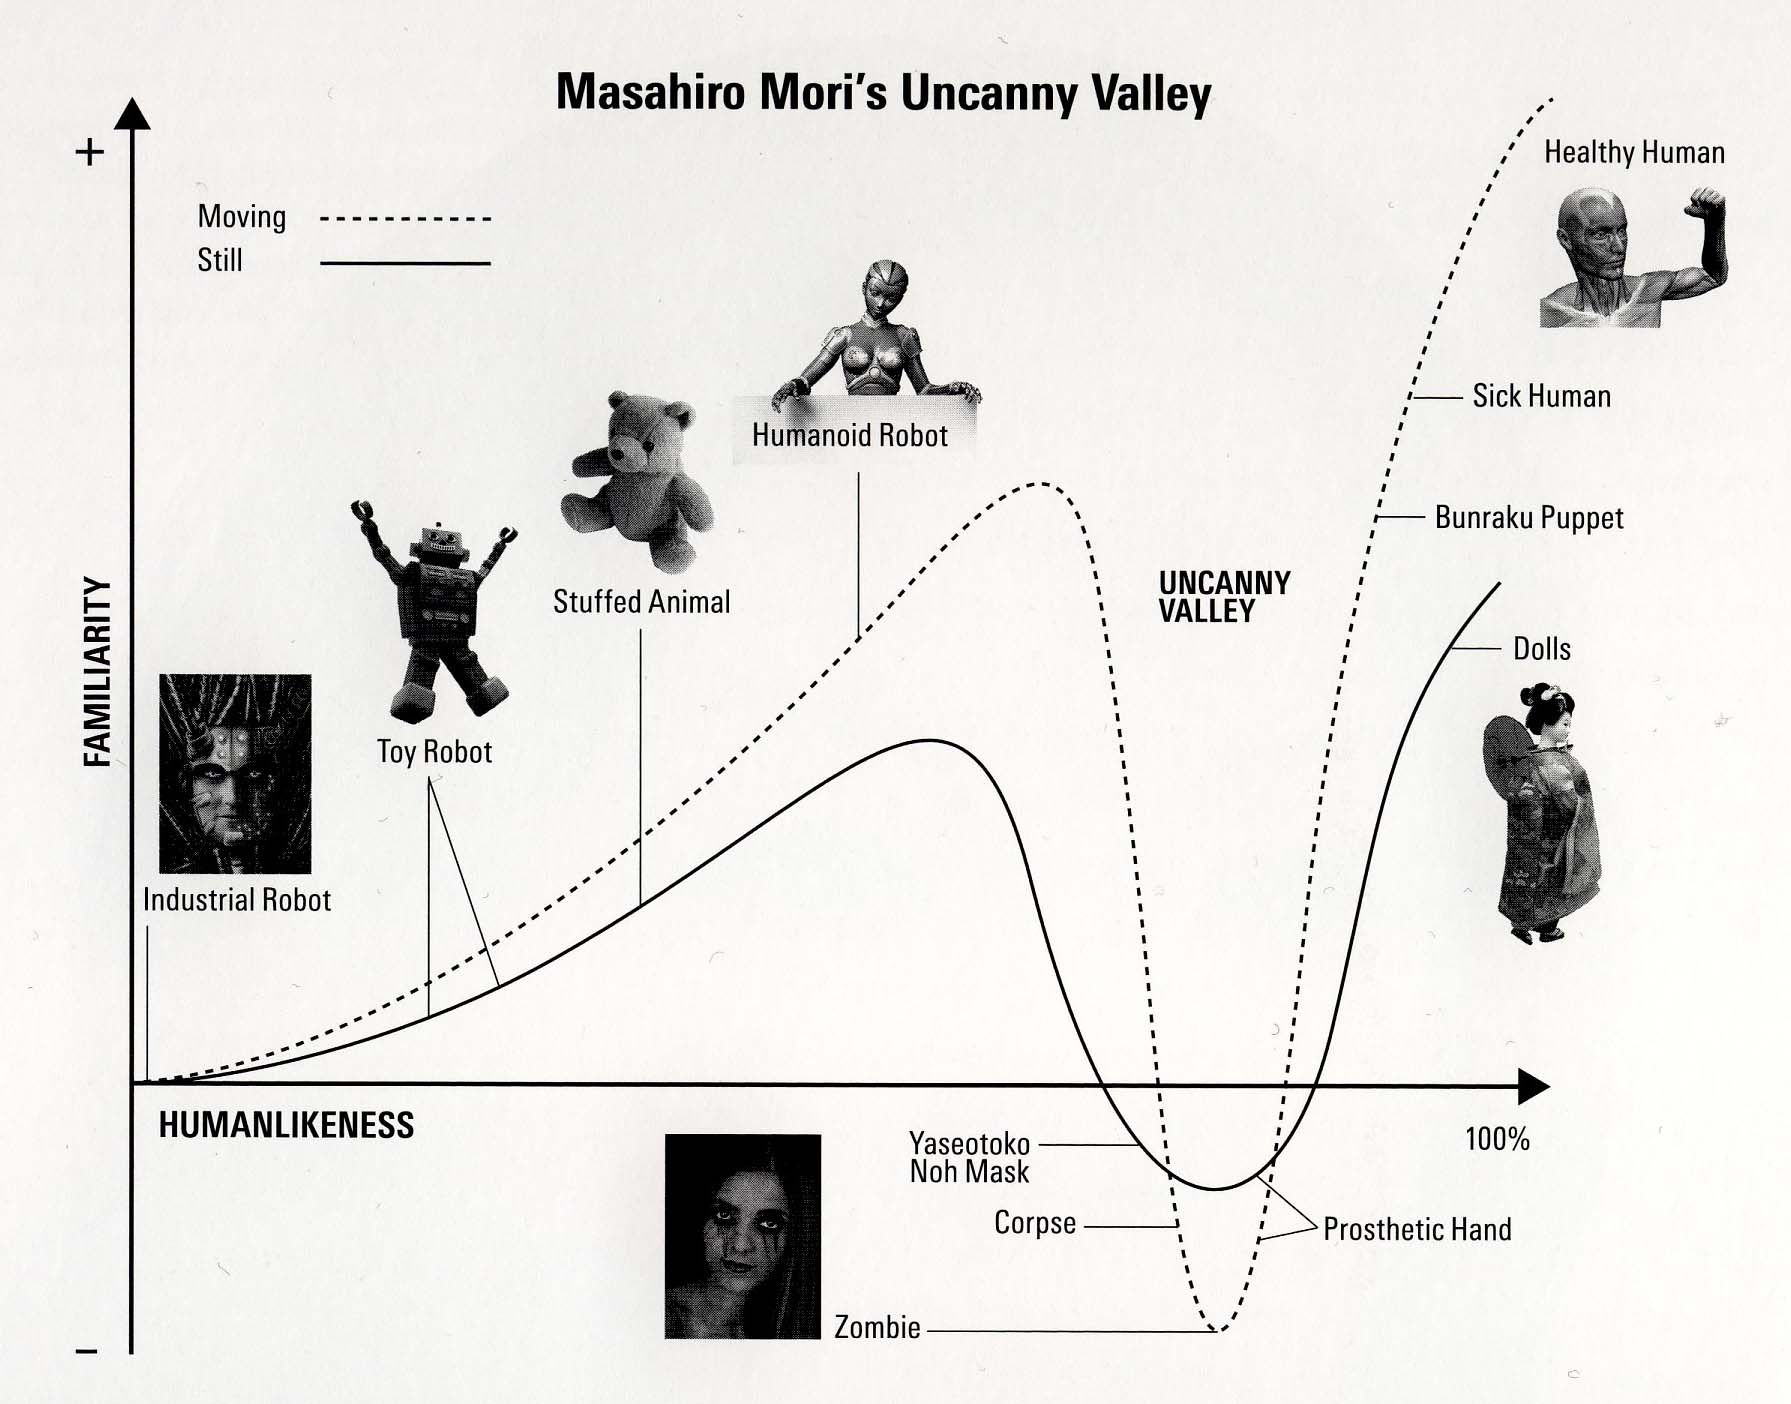 The Uncanny Valley Theory Of Masahiro Mori The Uncanny Noh Mask Humanoid Robot